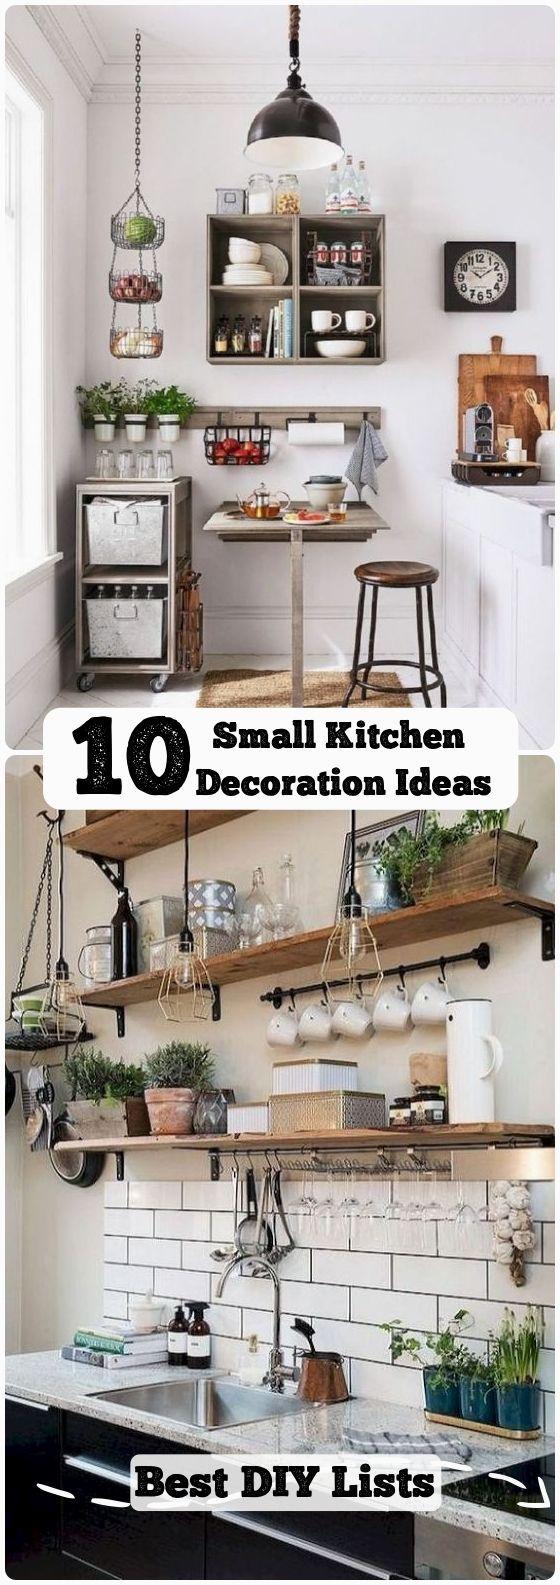 Affordable Kitchen RemodelNew Small Kitchen Decoration #smallkitchen #kitchen #kitchendecor #kitchenremodel #homedecor #kitchenremodeling